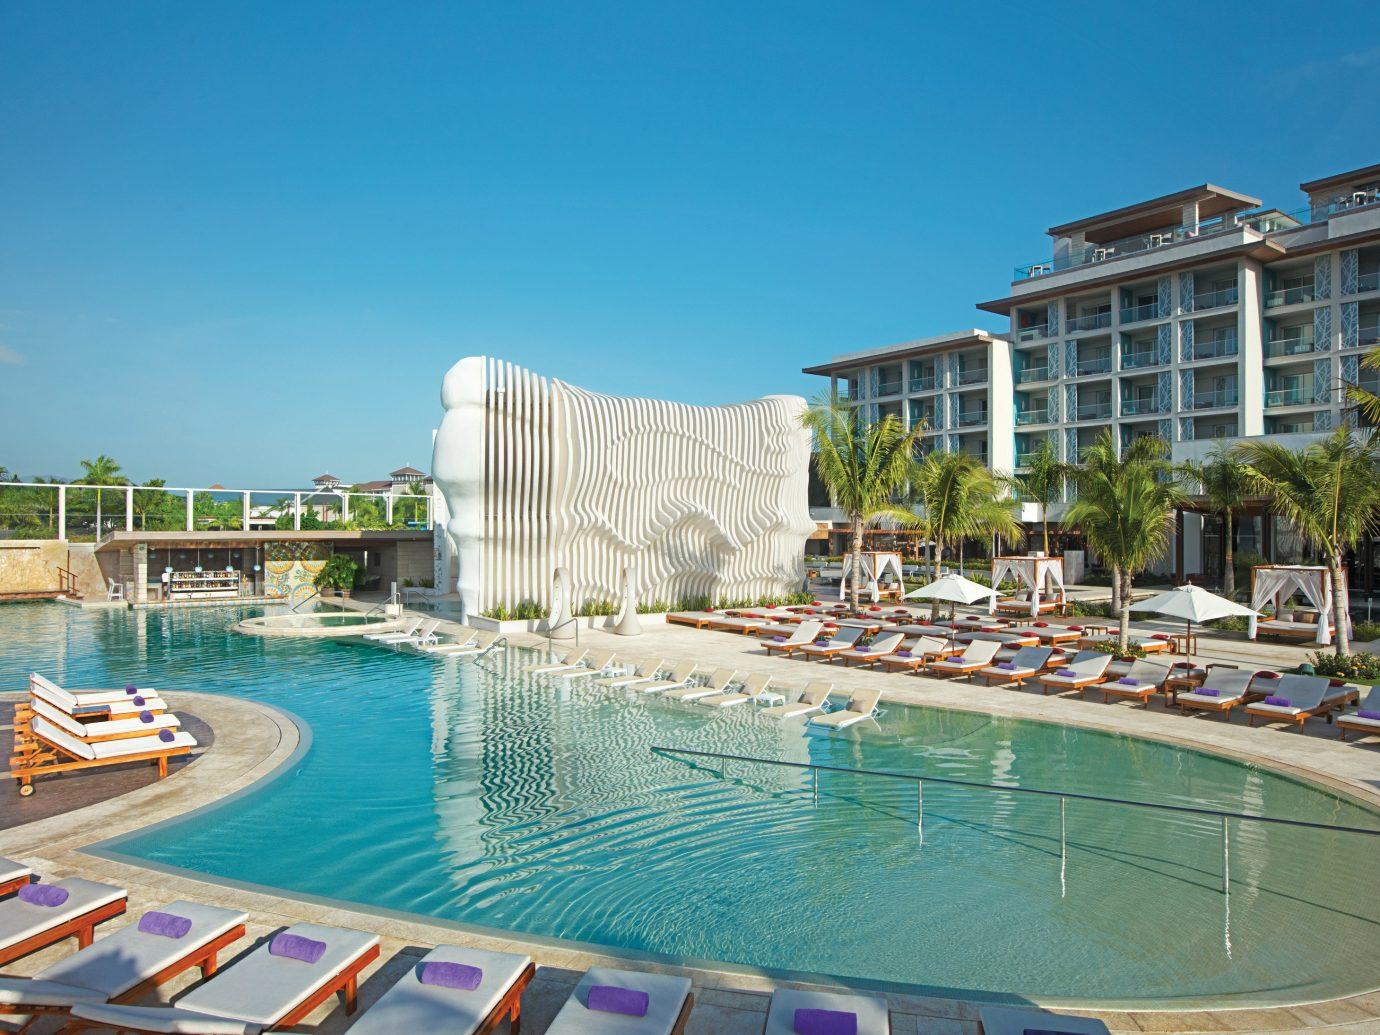 Pool at Breathless Montego Bay Resort & Spa, Jamaica